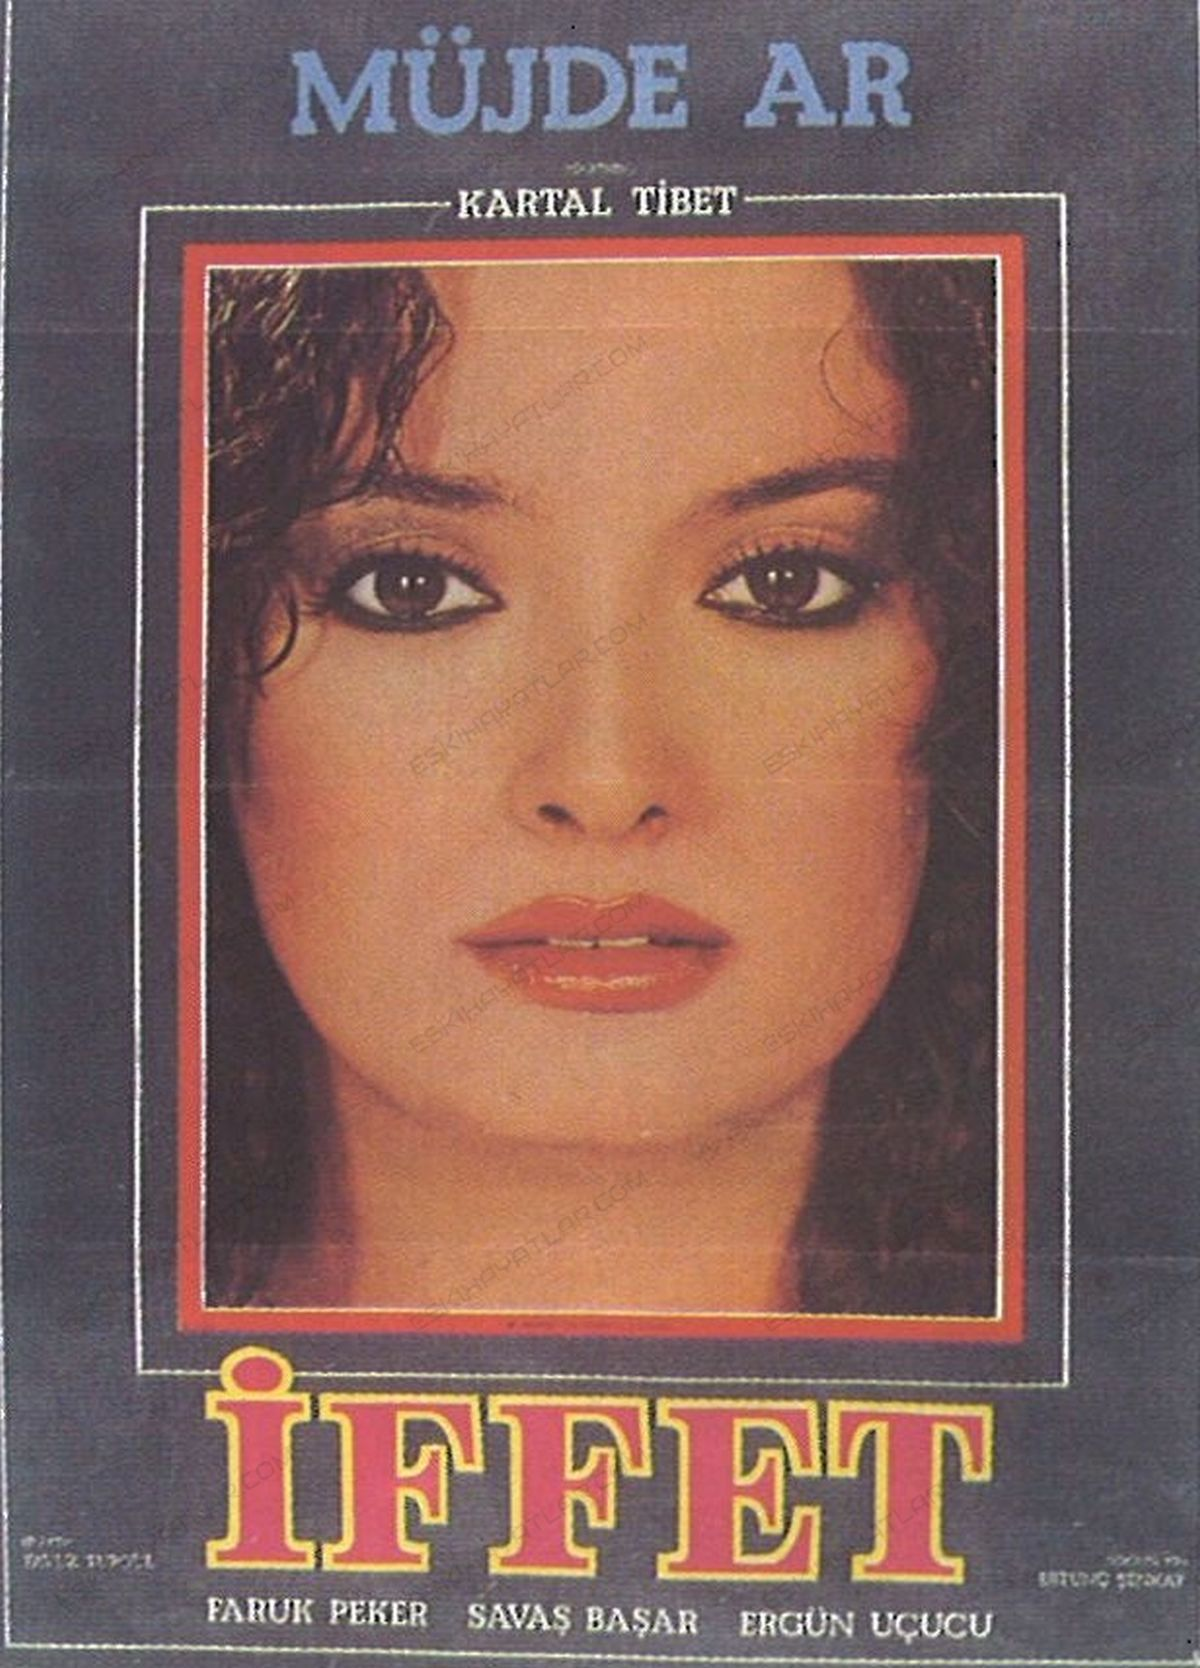 iffet-film-afisi-mujde-ar-faruk-peker-uzman-film(1982)